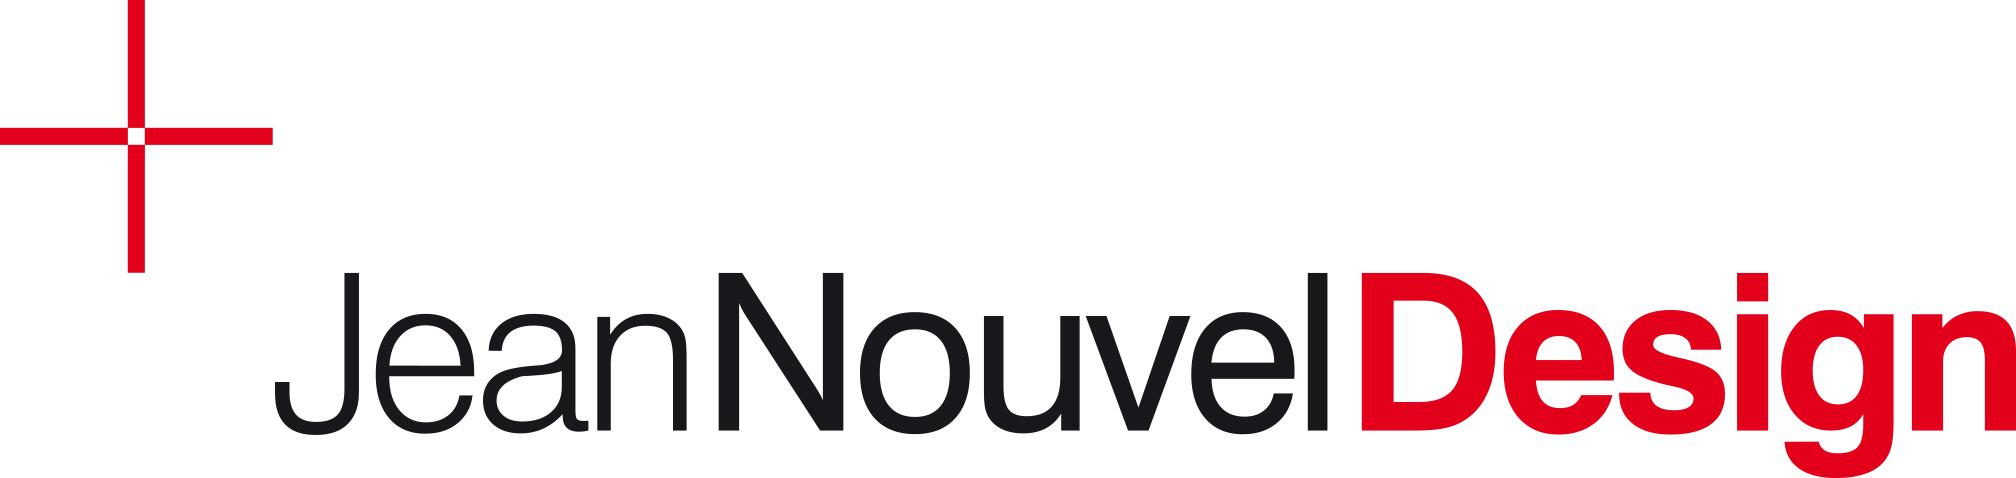 maison & objet - CREATOR OF THE YEAR - Jean Nouvel Design